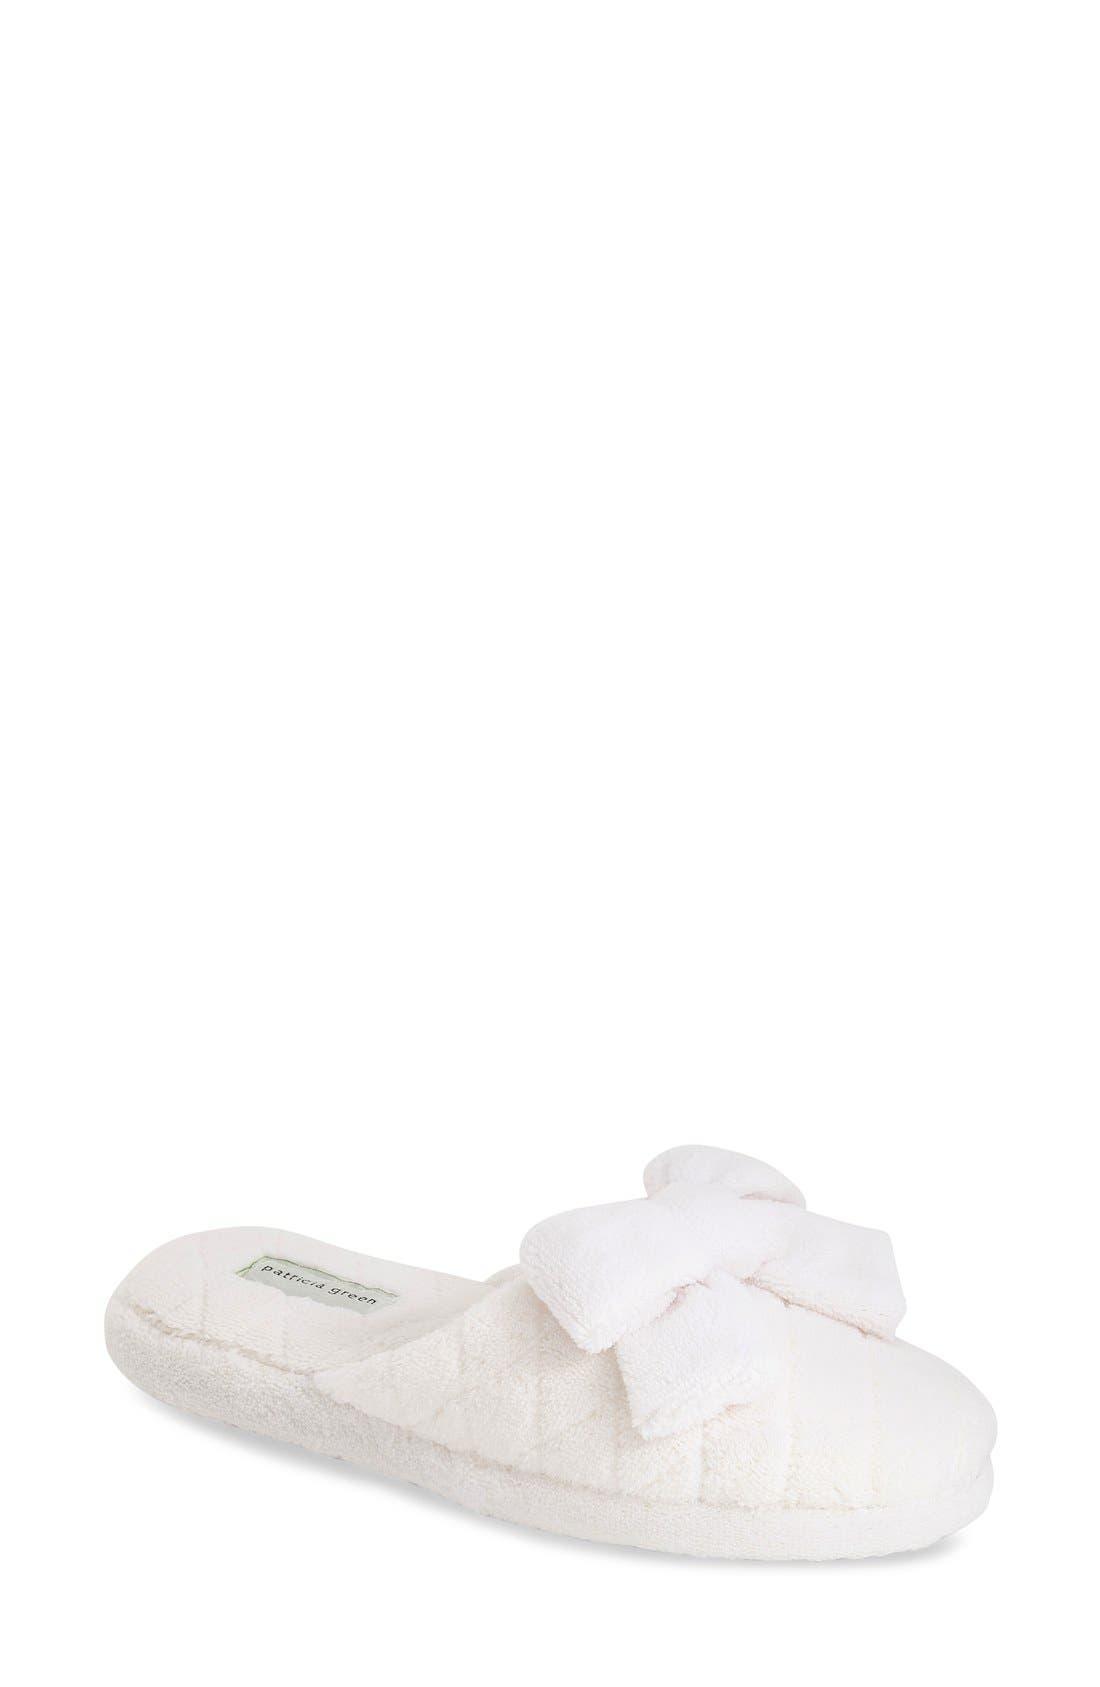 'Bonnie' Bow Slipper,                         Main,                         color, WHITE